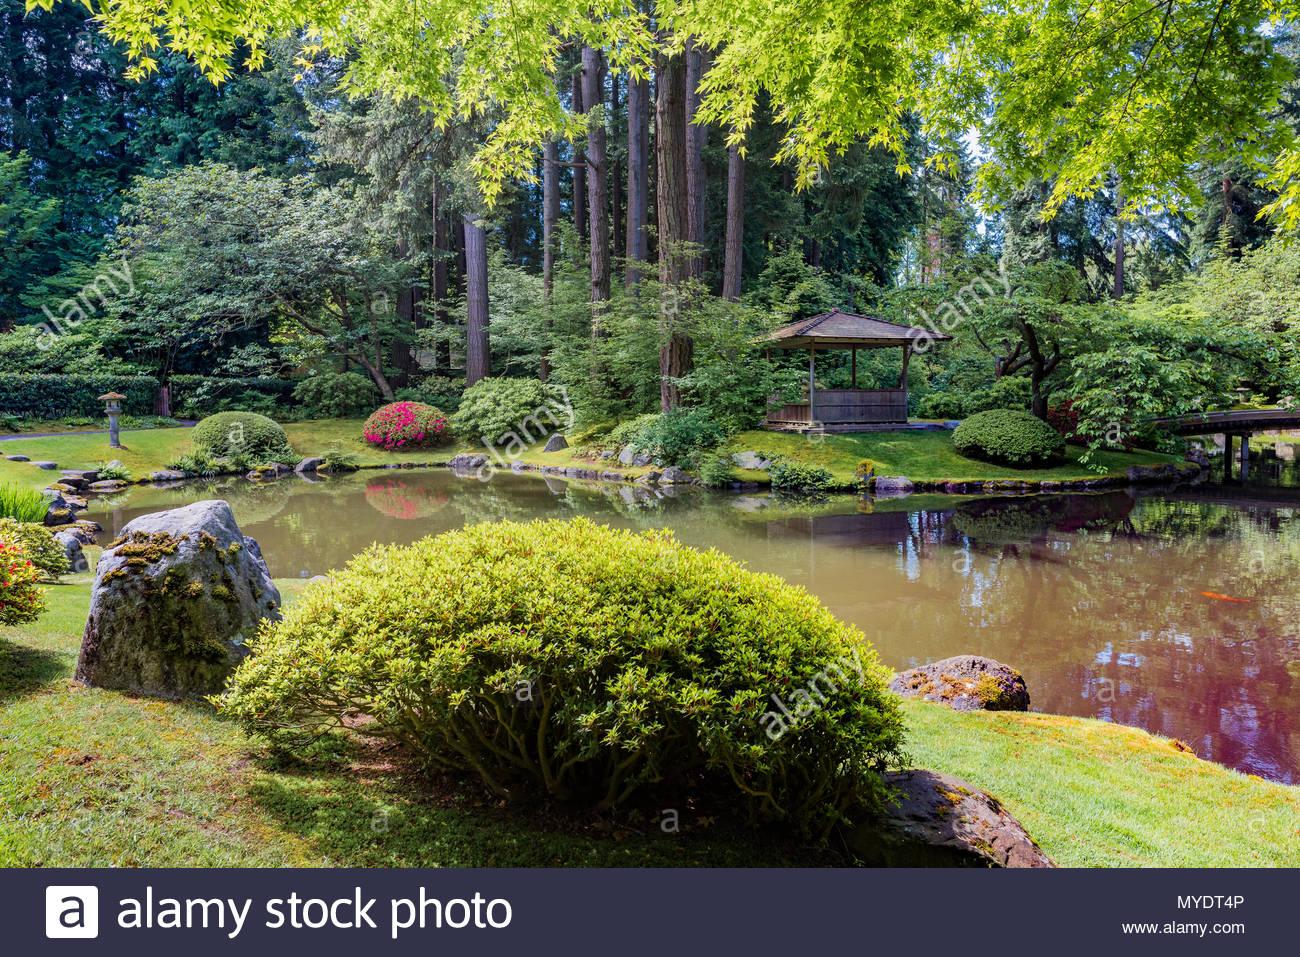 Nitobe Memorial Garden, traditional Japanese garden, University of British Columbia, Vancouver, British Columbia, Canada.